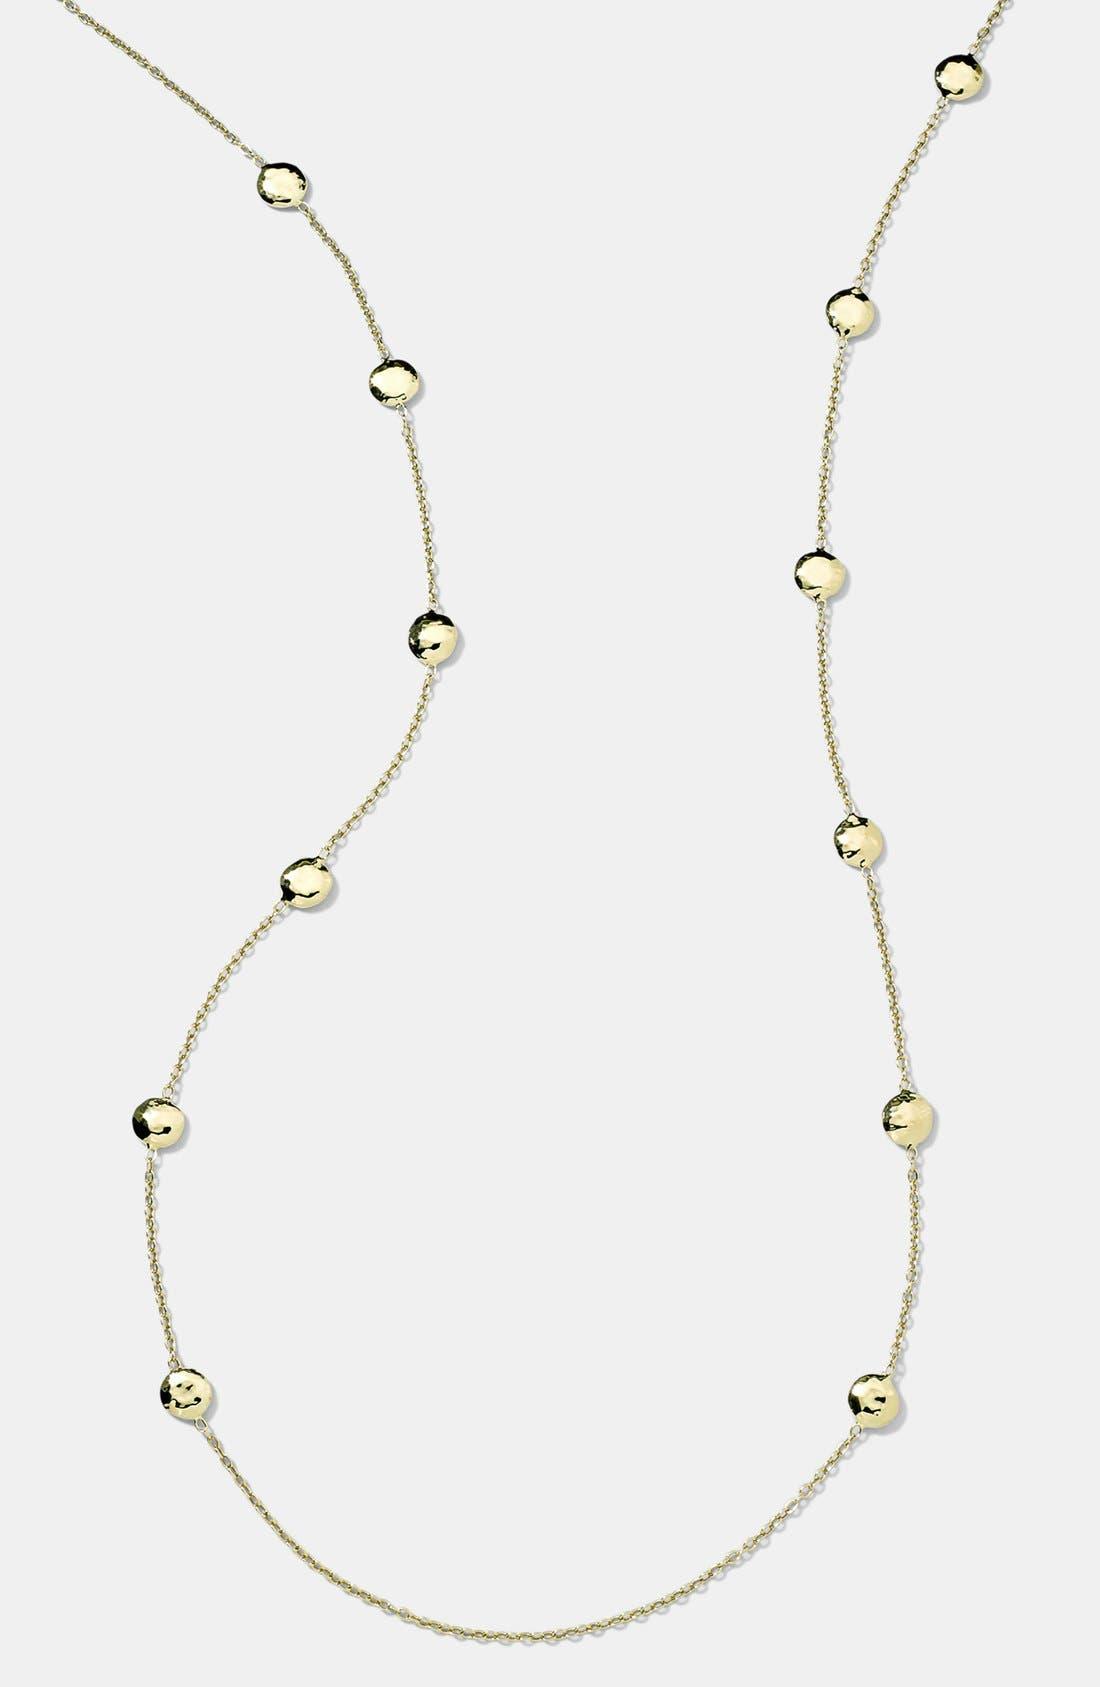 Main Image - Ippolita 'Glamazon - Pinball' 18k Gold Long Station Necklace